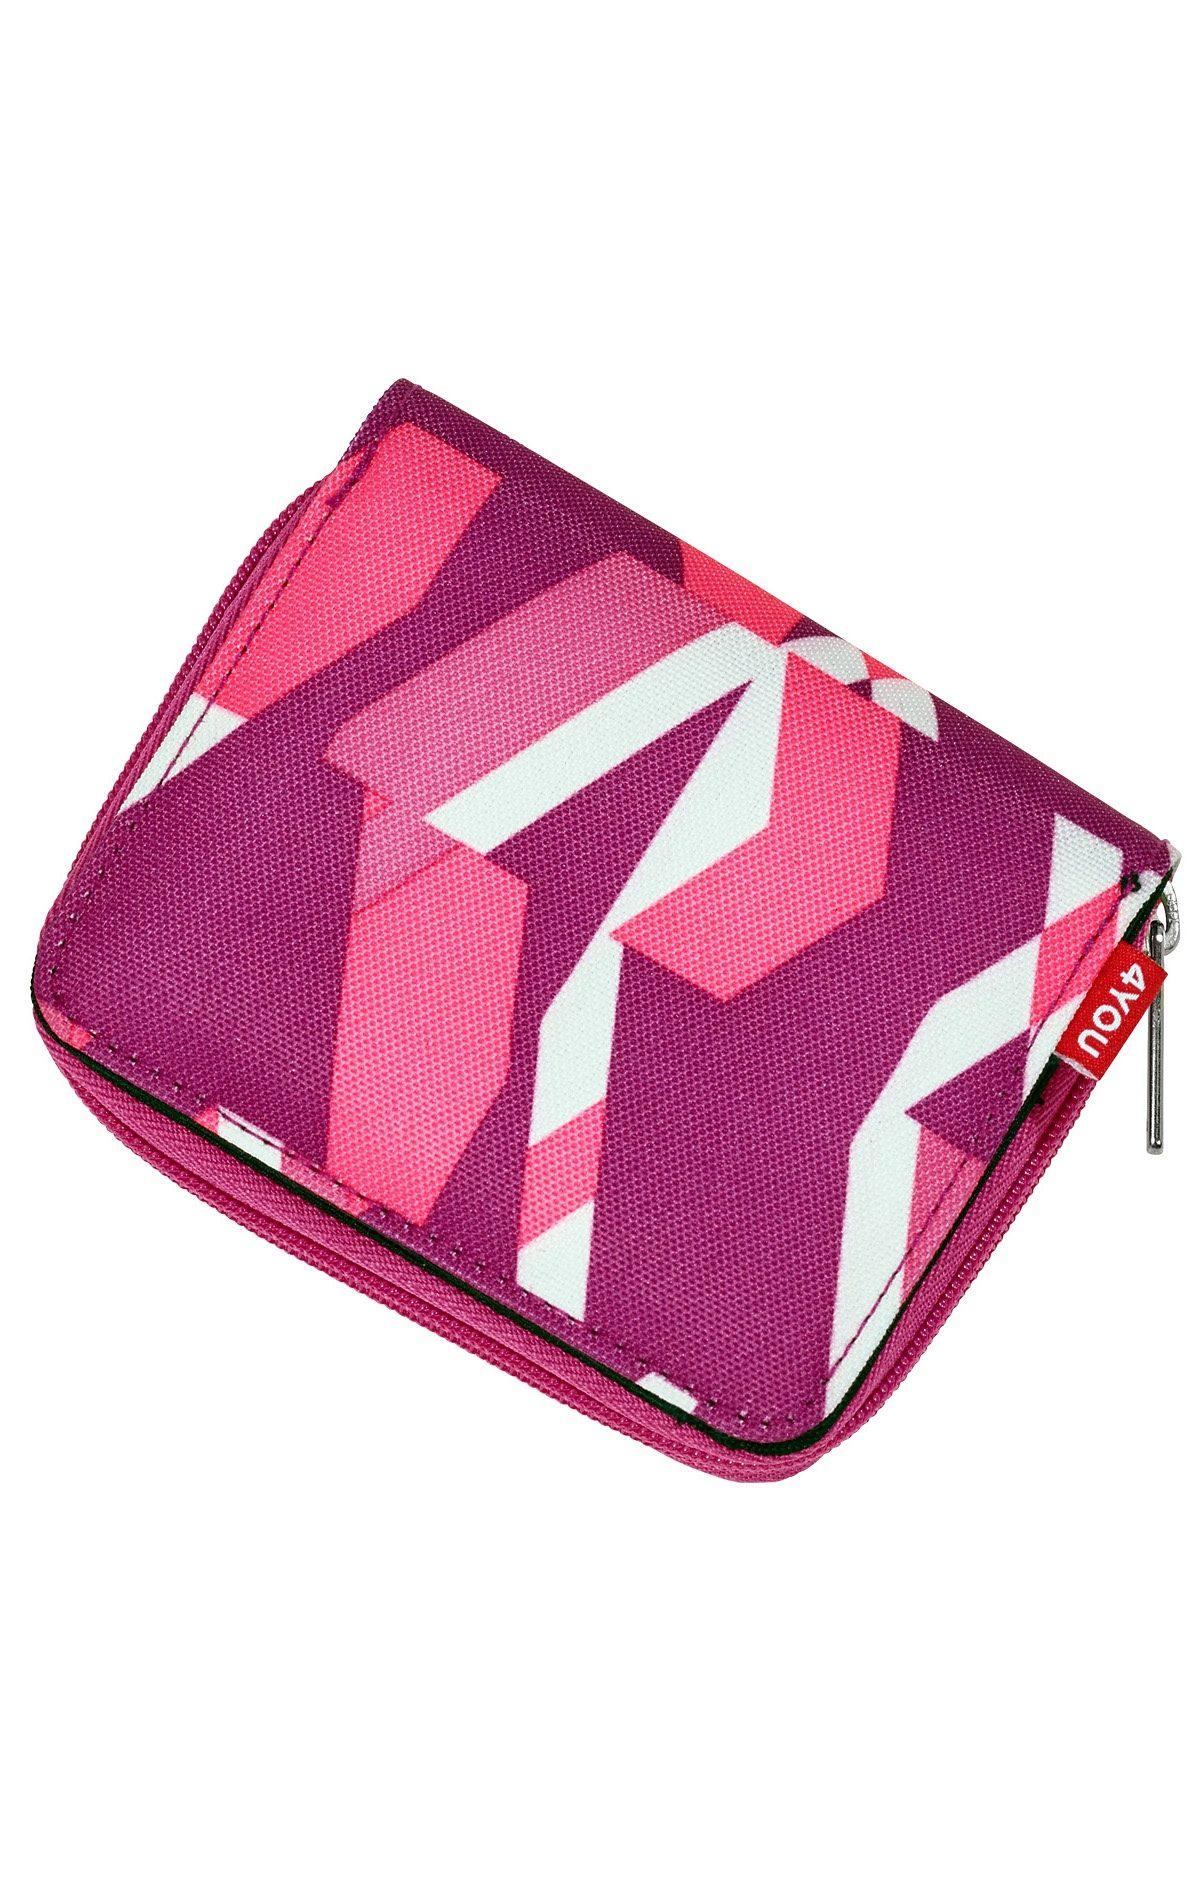 4YOU Geldbörse mit Reißveschluss Zipper Wallet, »Chequer Pink«